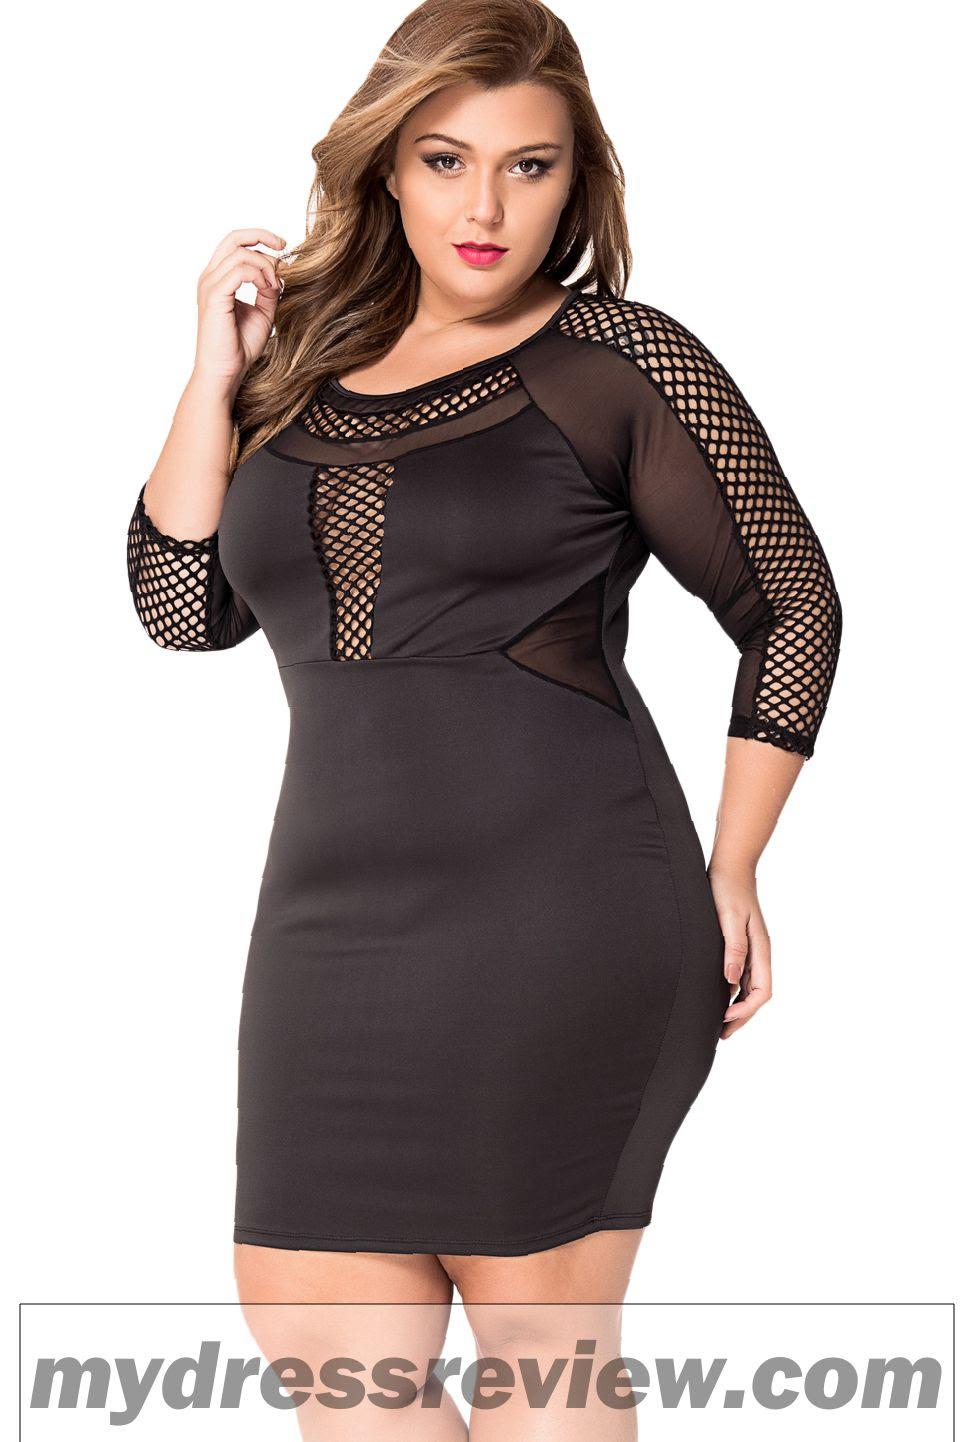 Dresses long size dresses bodycon plus hawaiian style edgy short sleeve